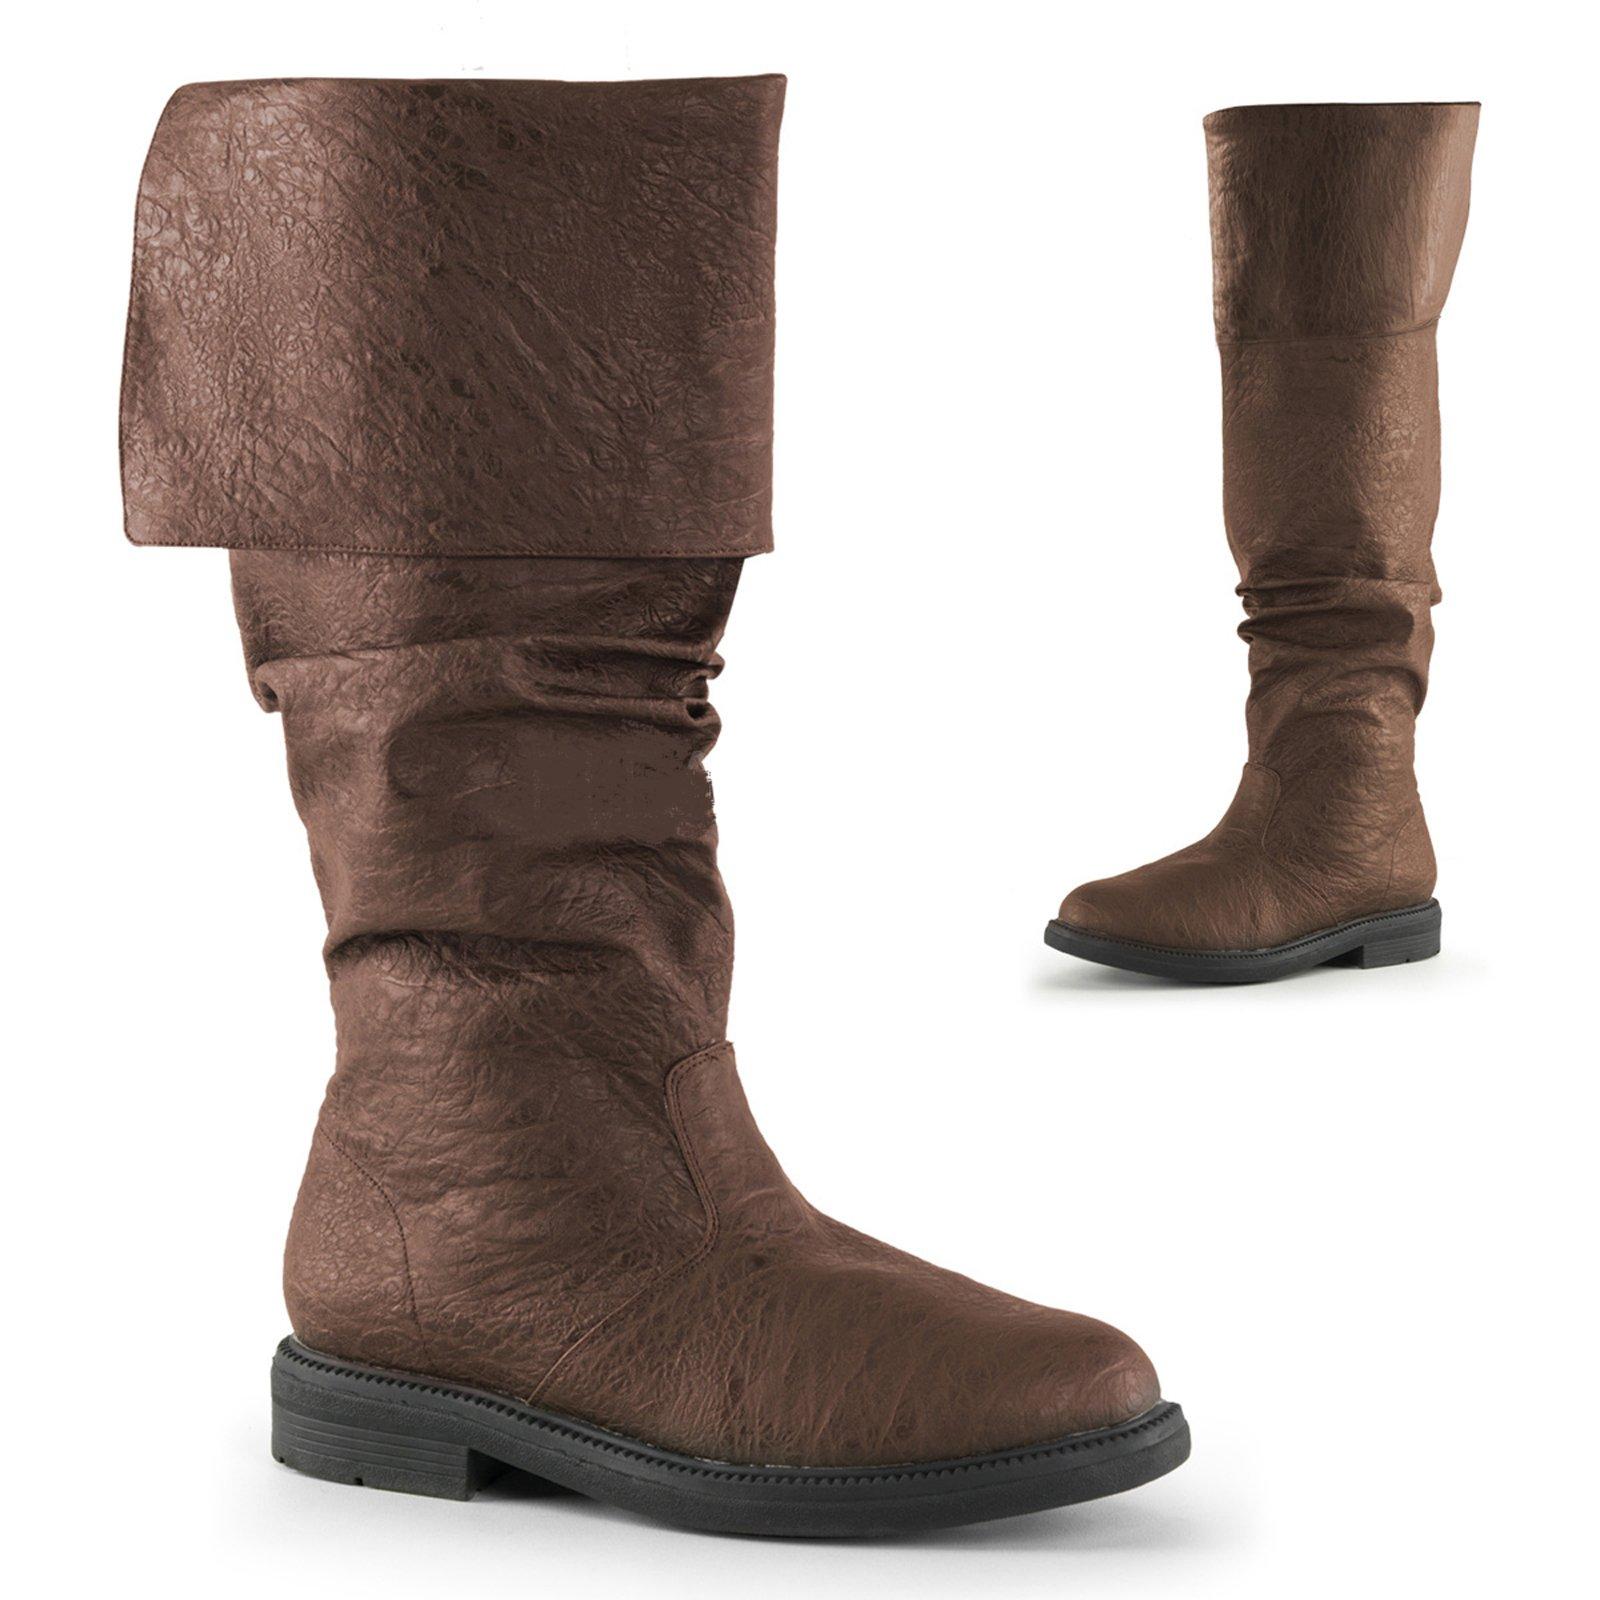 Endless Road RH100 Medium 10-11 Brown Robin Hood Knee High Boots with Cuffs